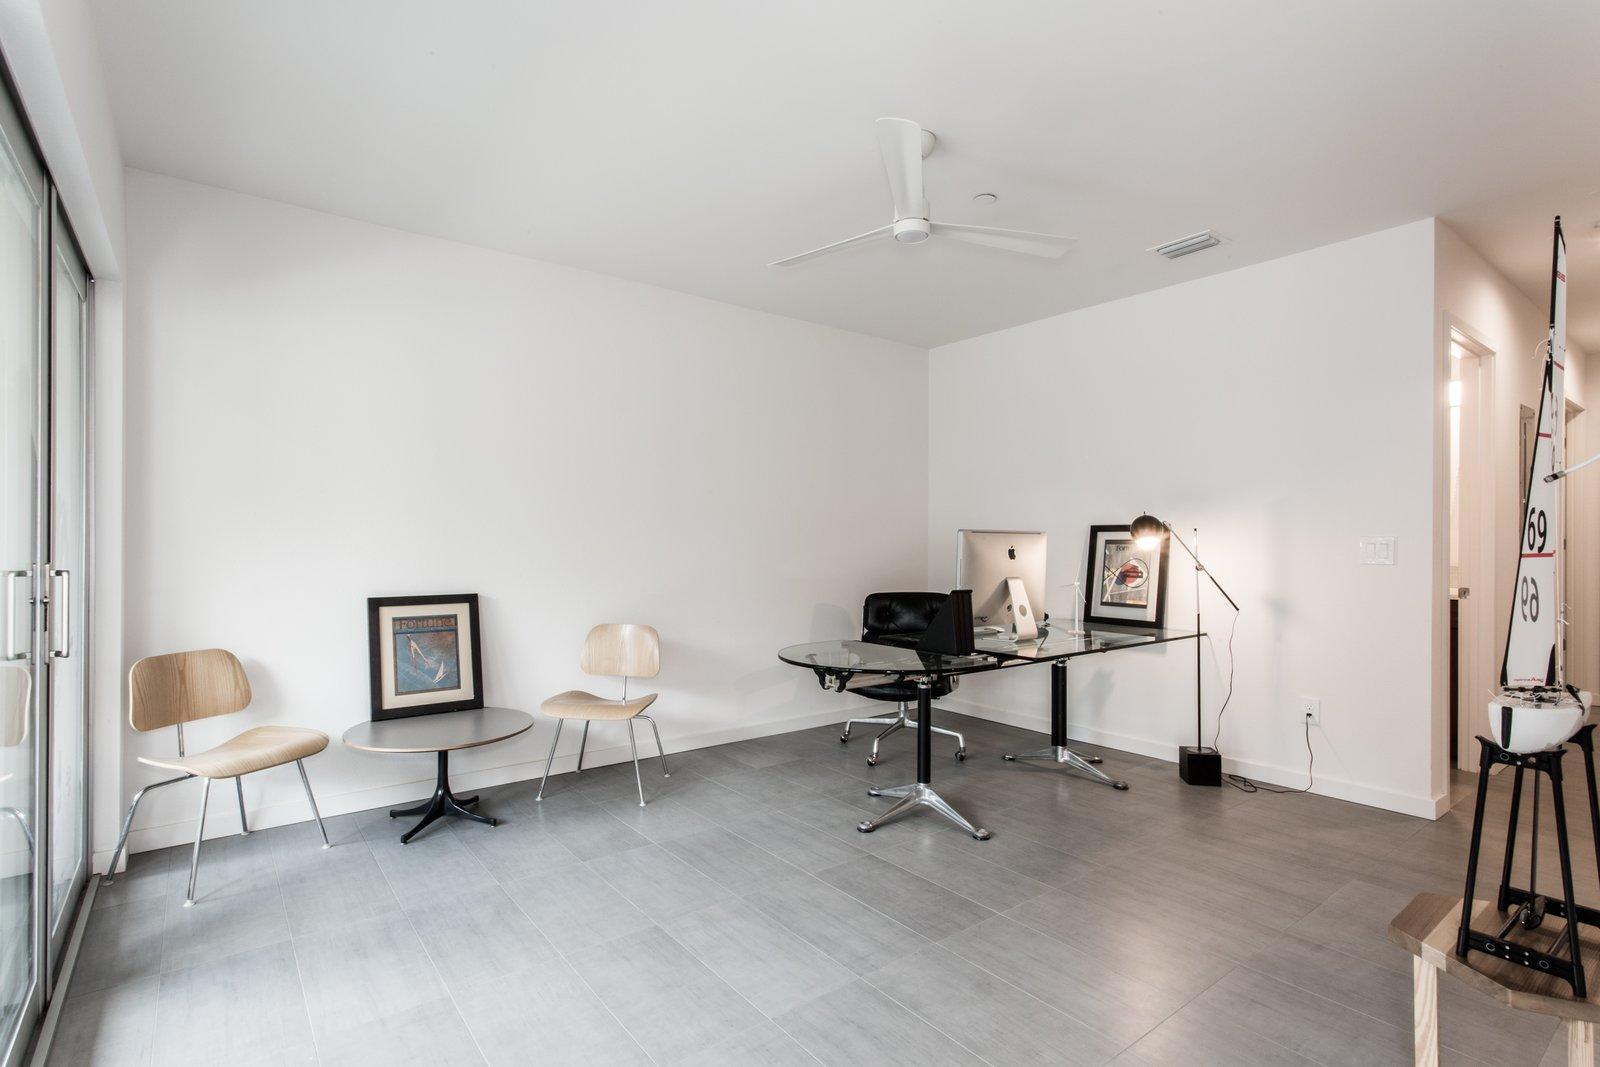 Office.  LIV233 by Hudson Harr